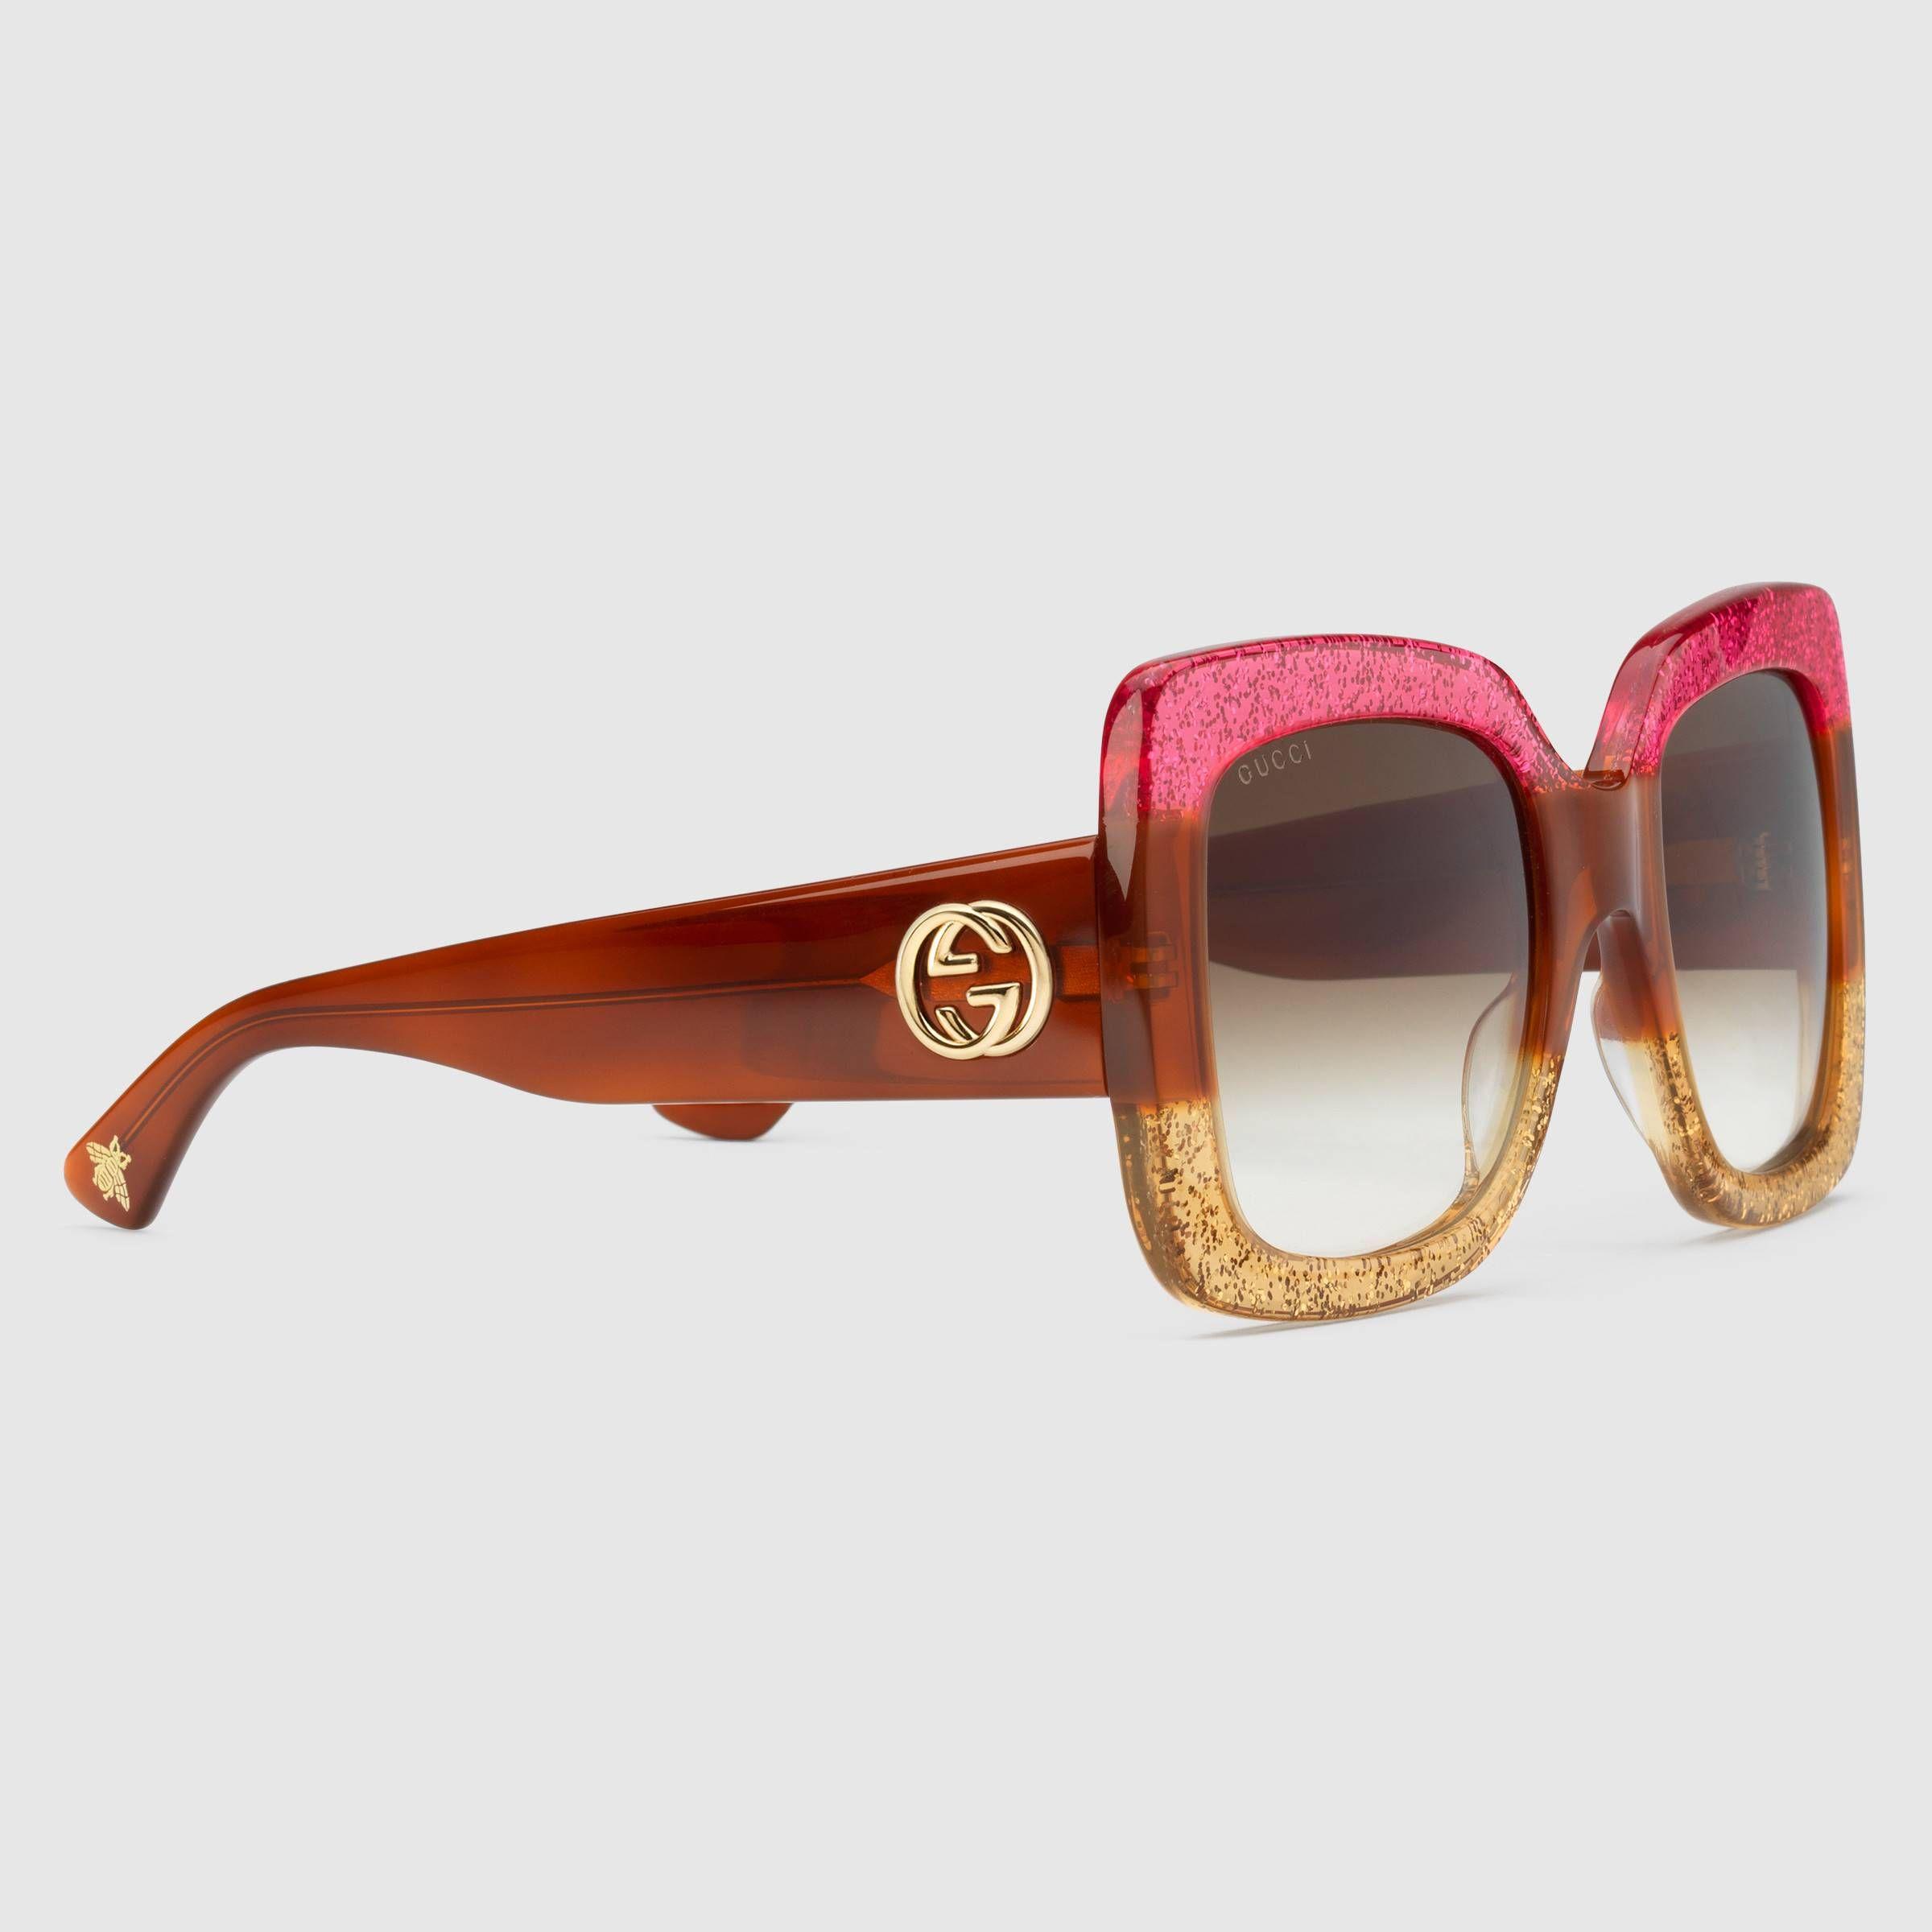 7ce207a420 Square-frame acetate sunglasses - Gucci Women s Square   Rectangle  461705J07405670